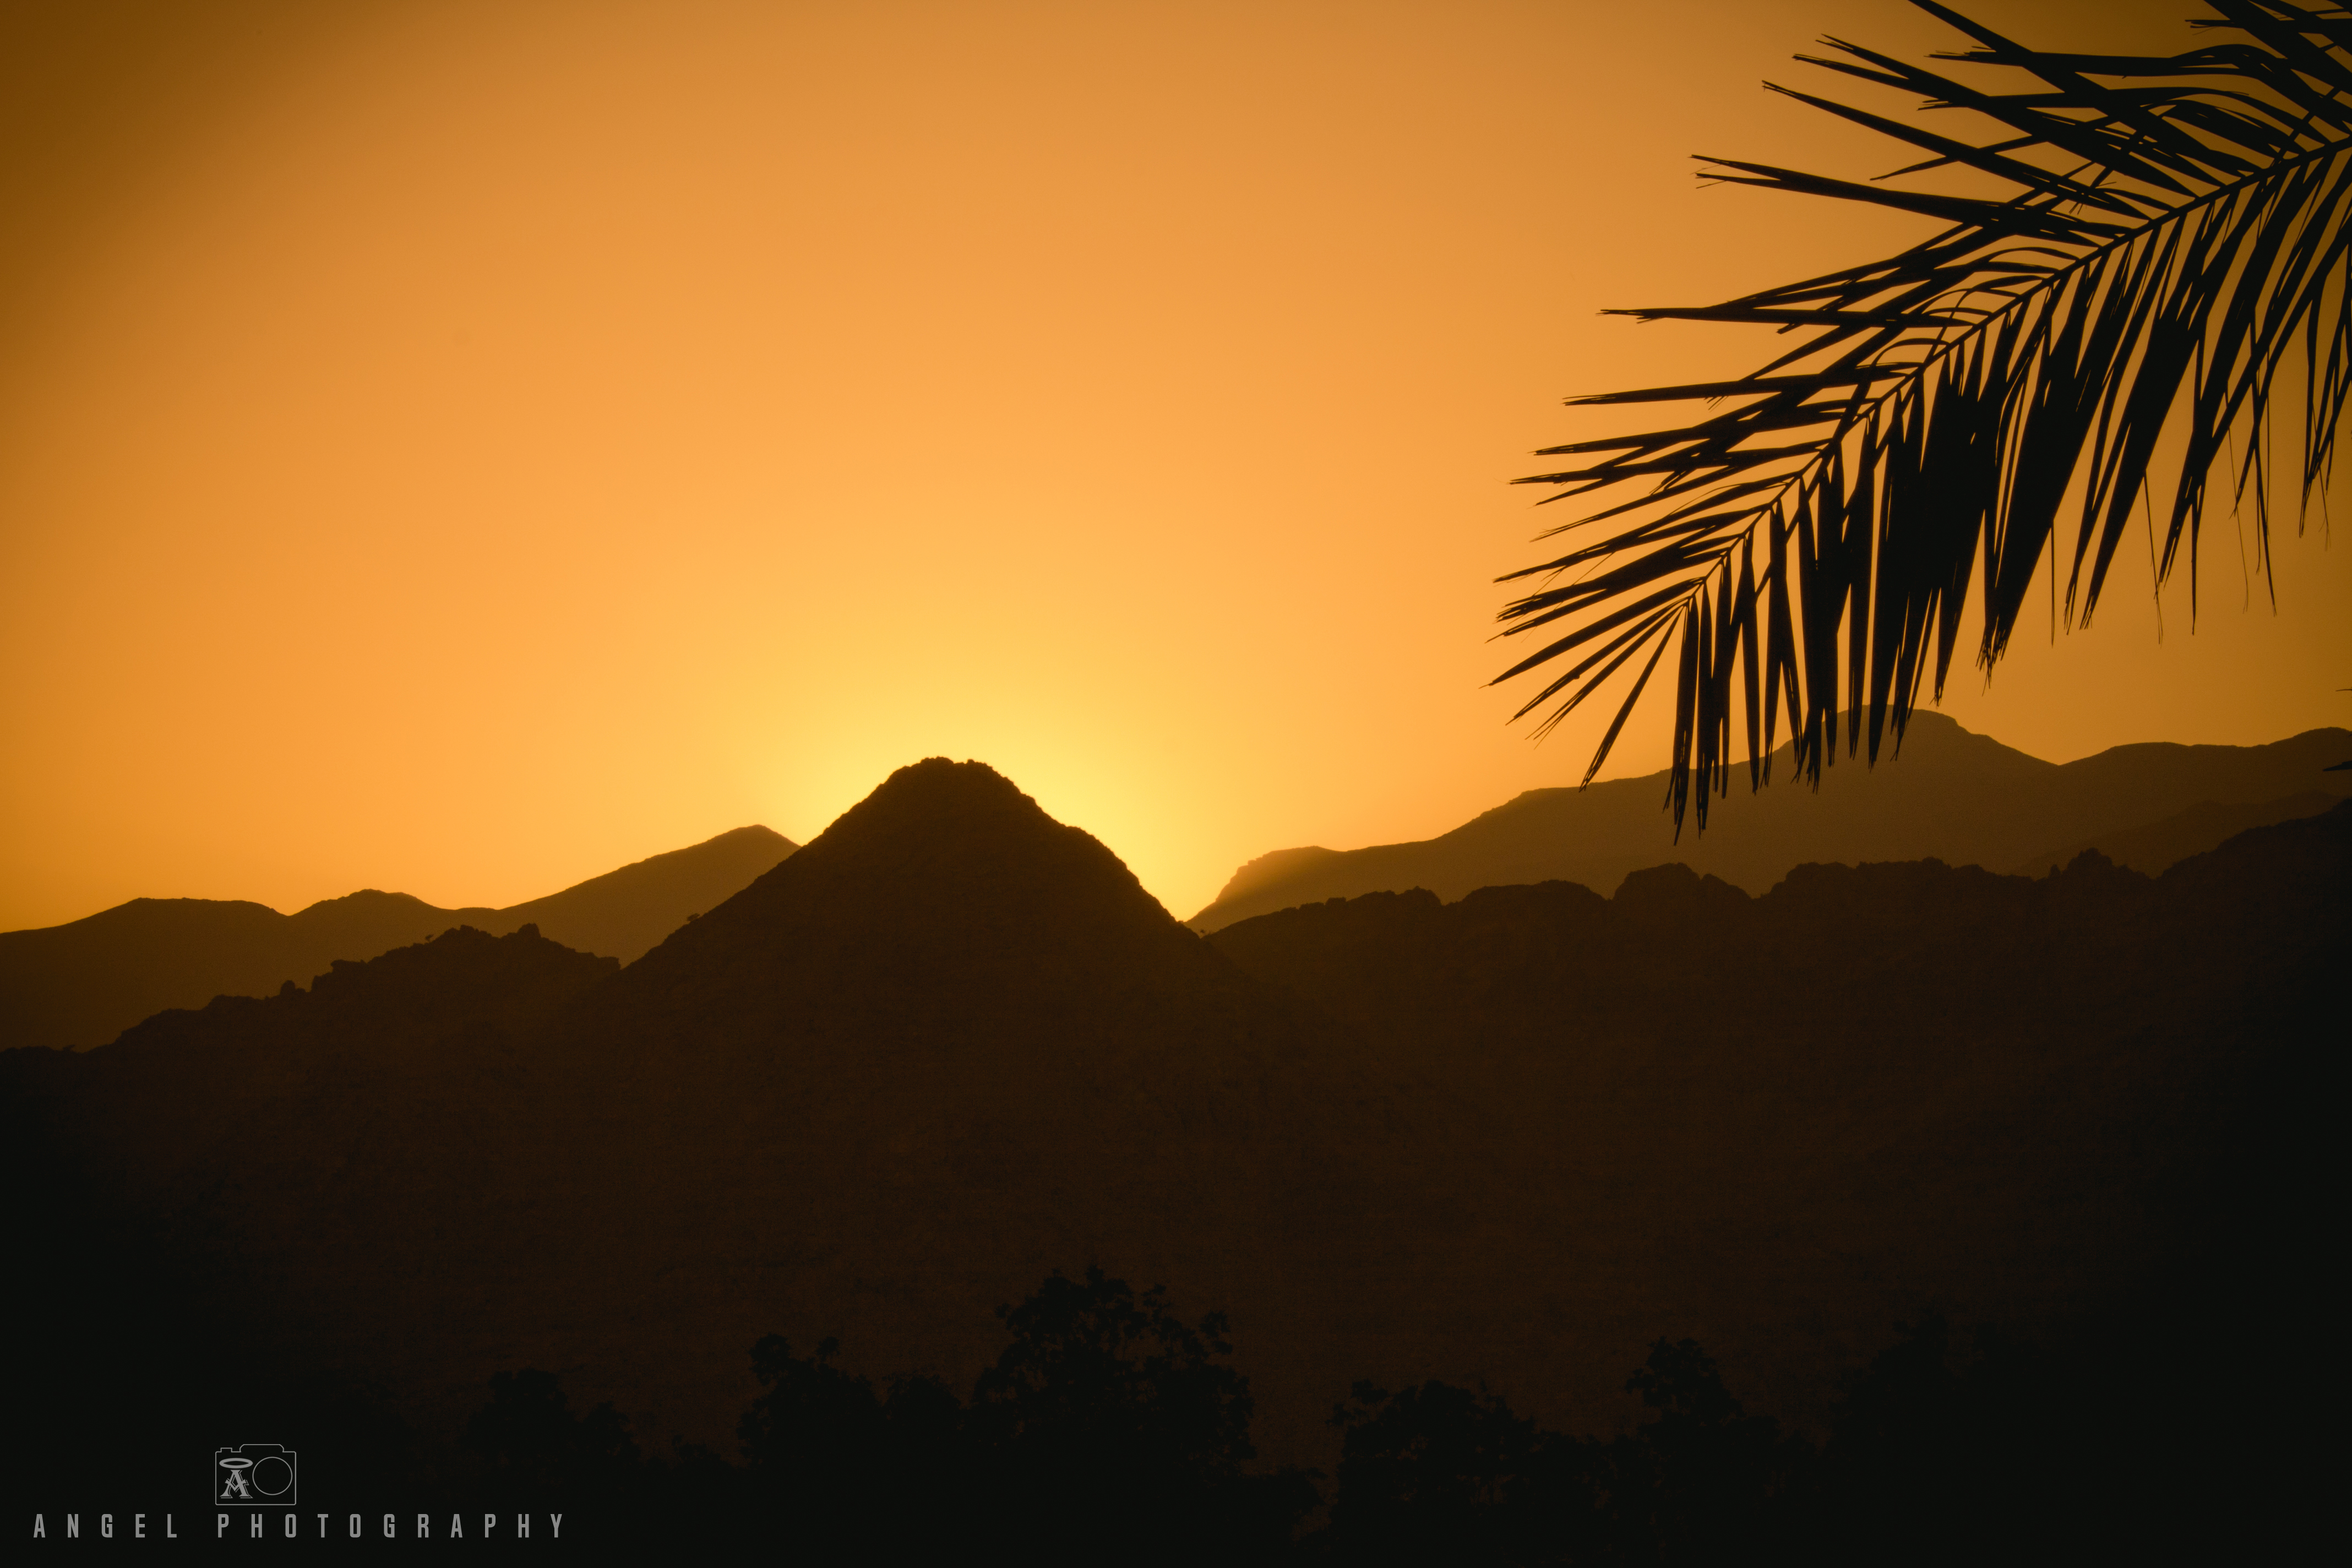 Dibba, Oman, Landscape, Dhow Cruise, Musandam Tour, Sunset, Rock Mountains